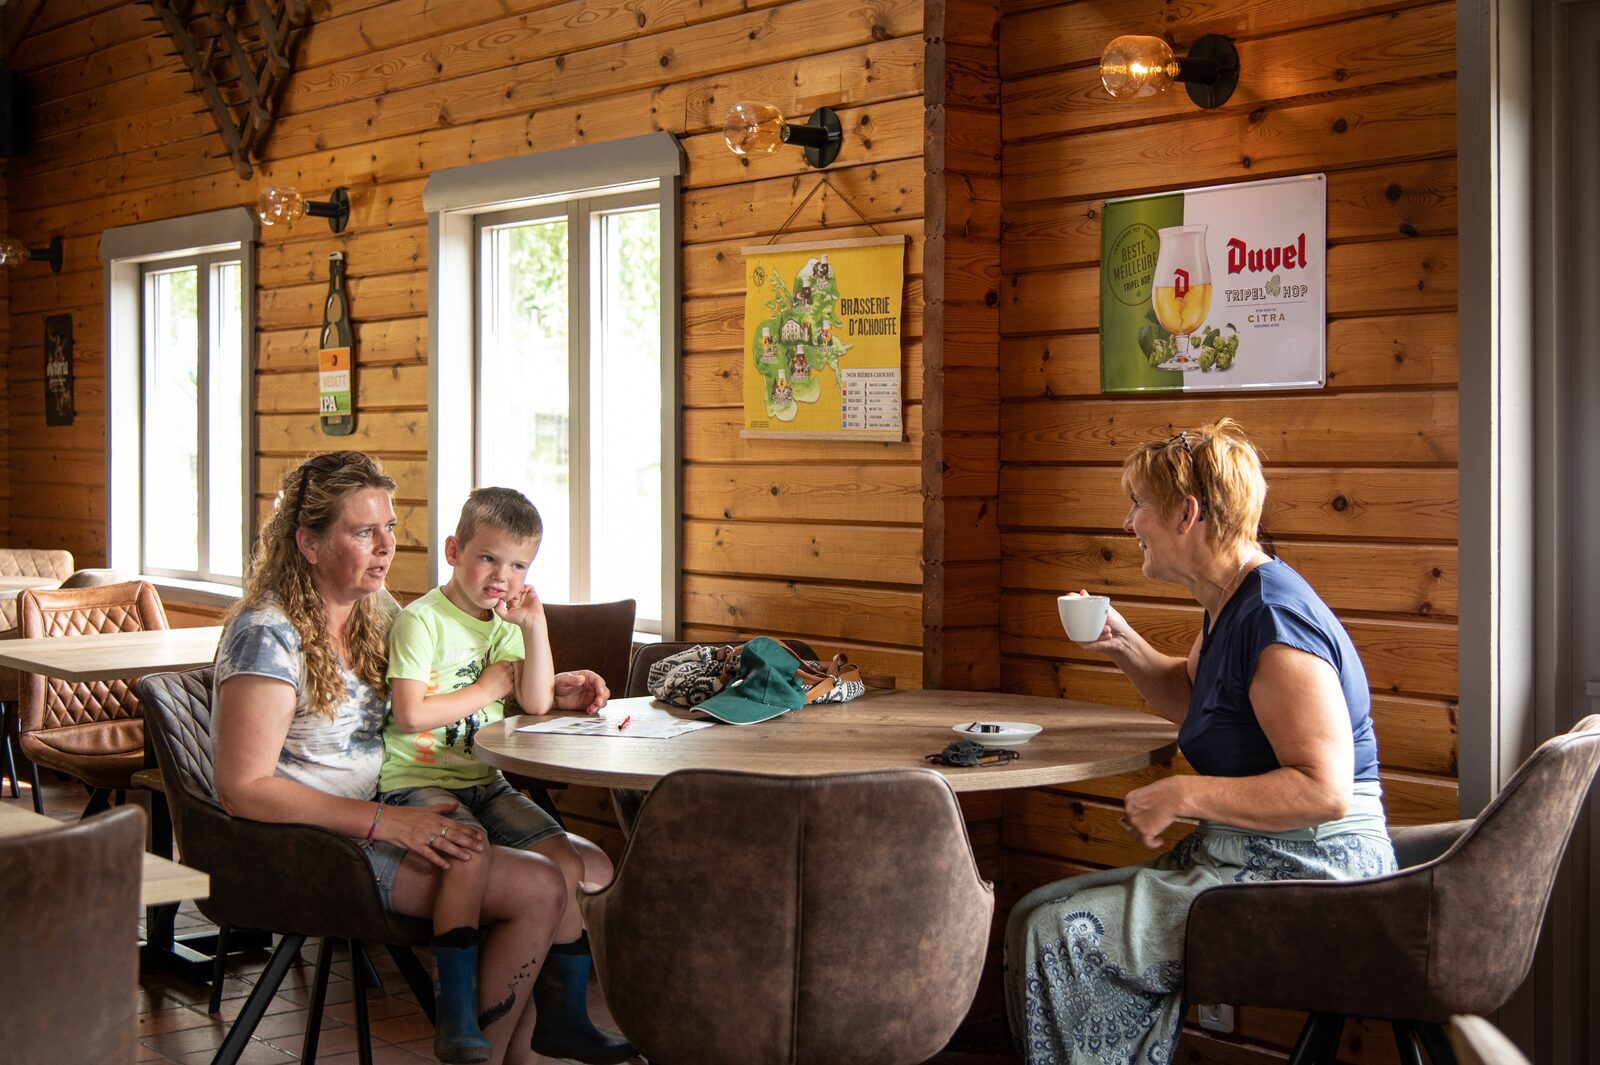 Facilities - Bar and restaurant | Petite Suisse